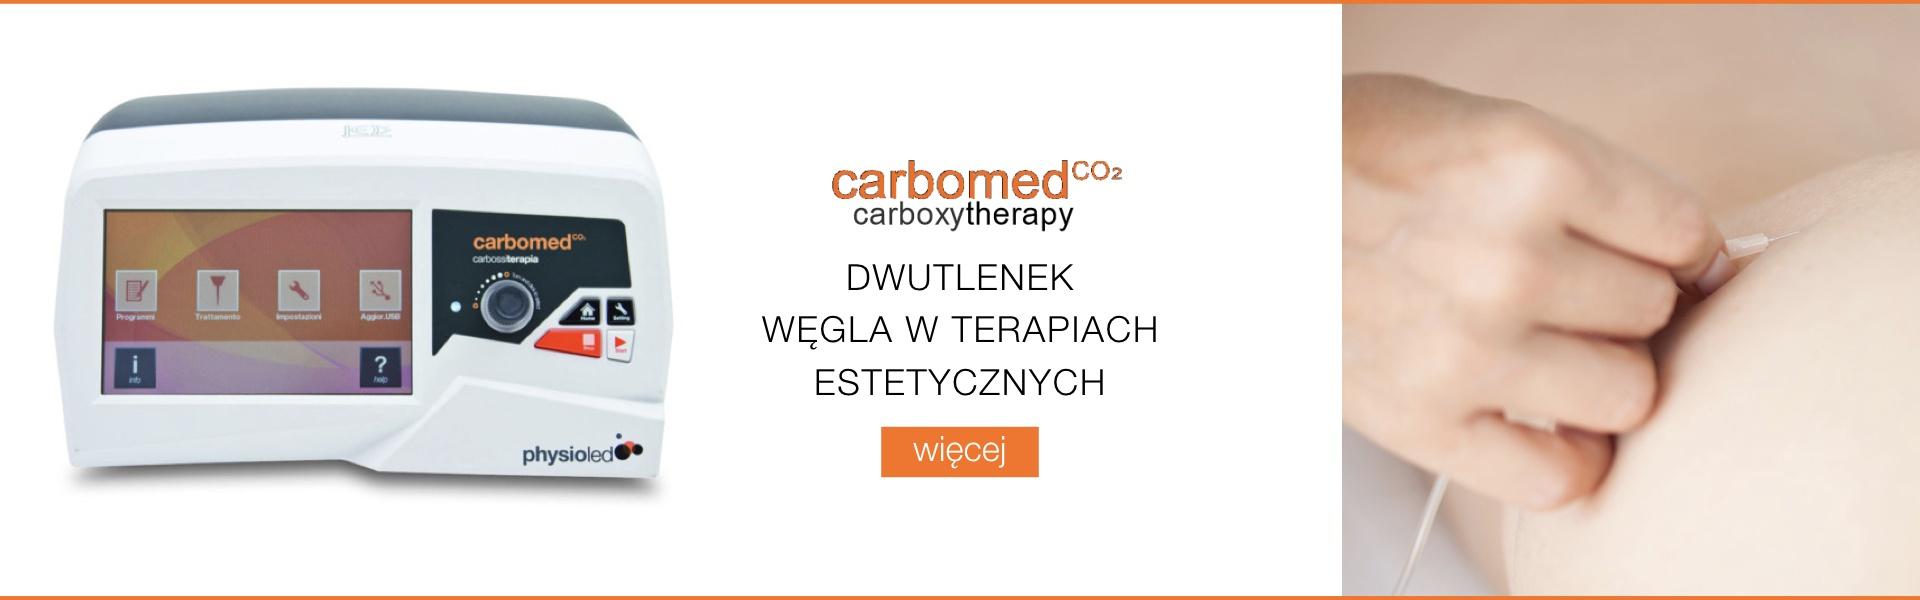 slider carbomed carboxytherapy